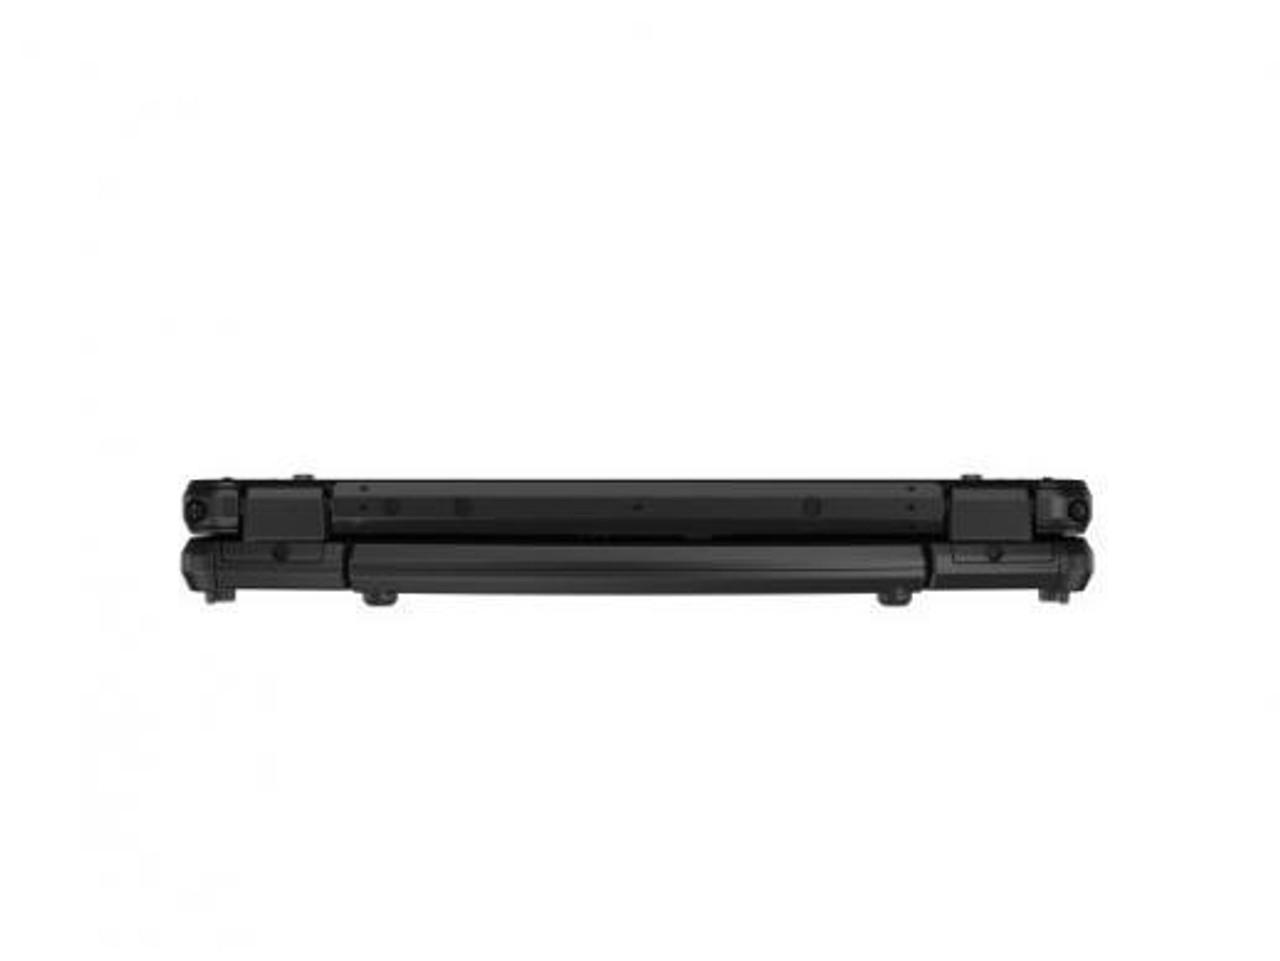 Panasonic Toughbook CF-20 ports 4